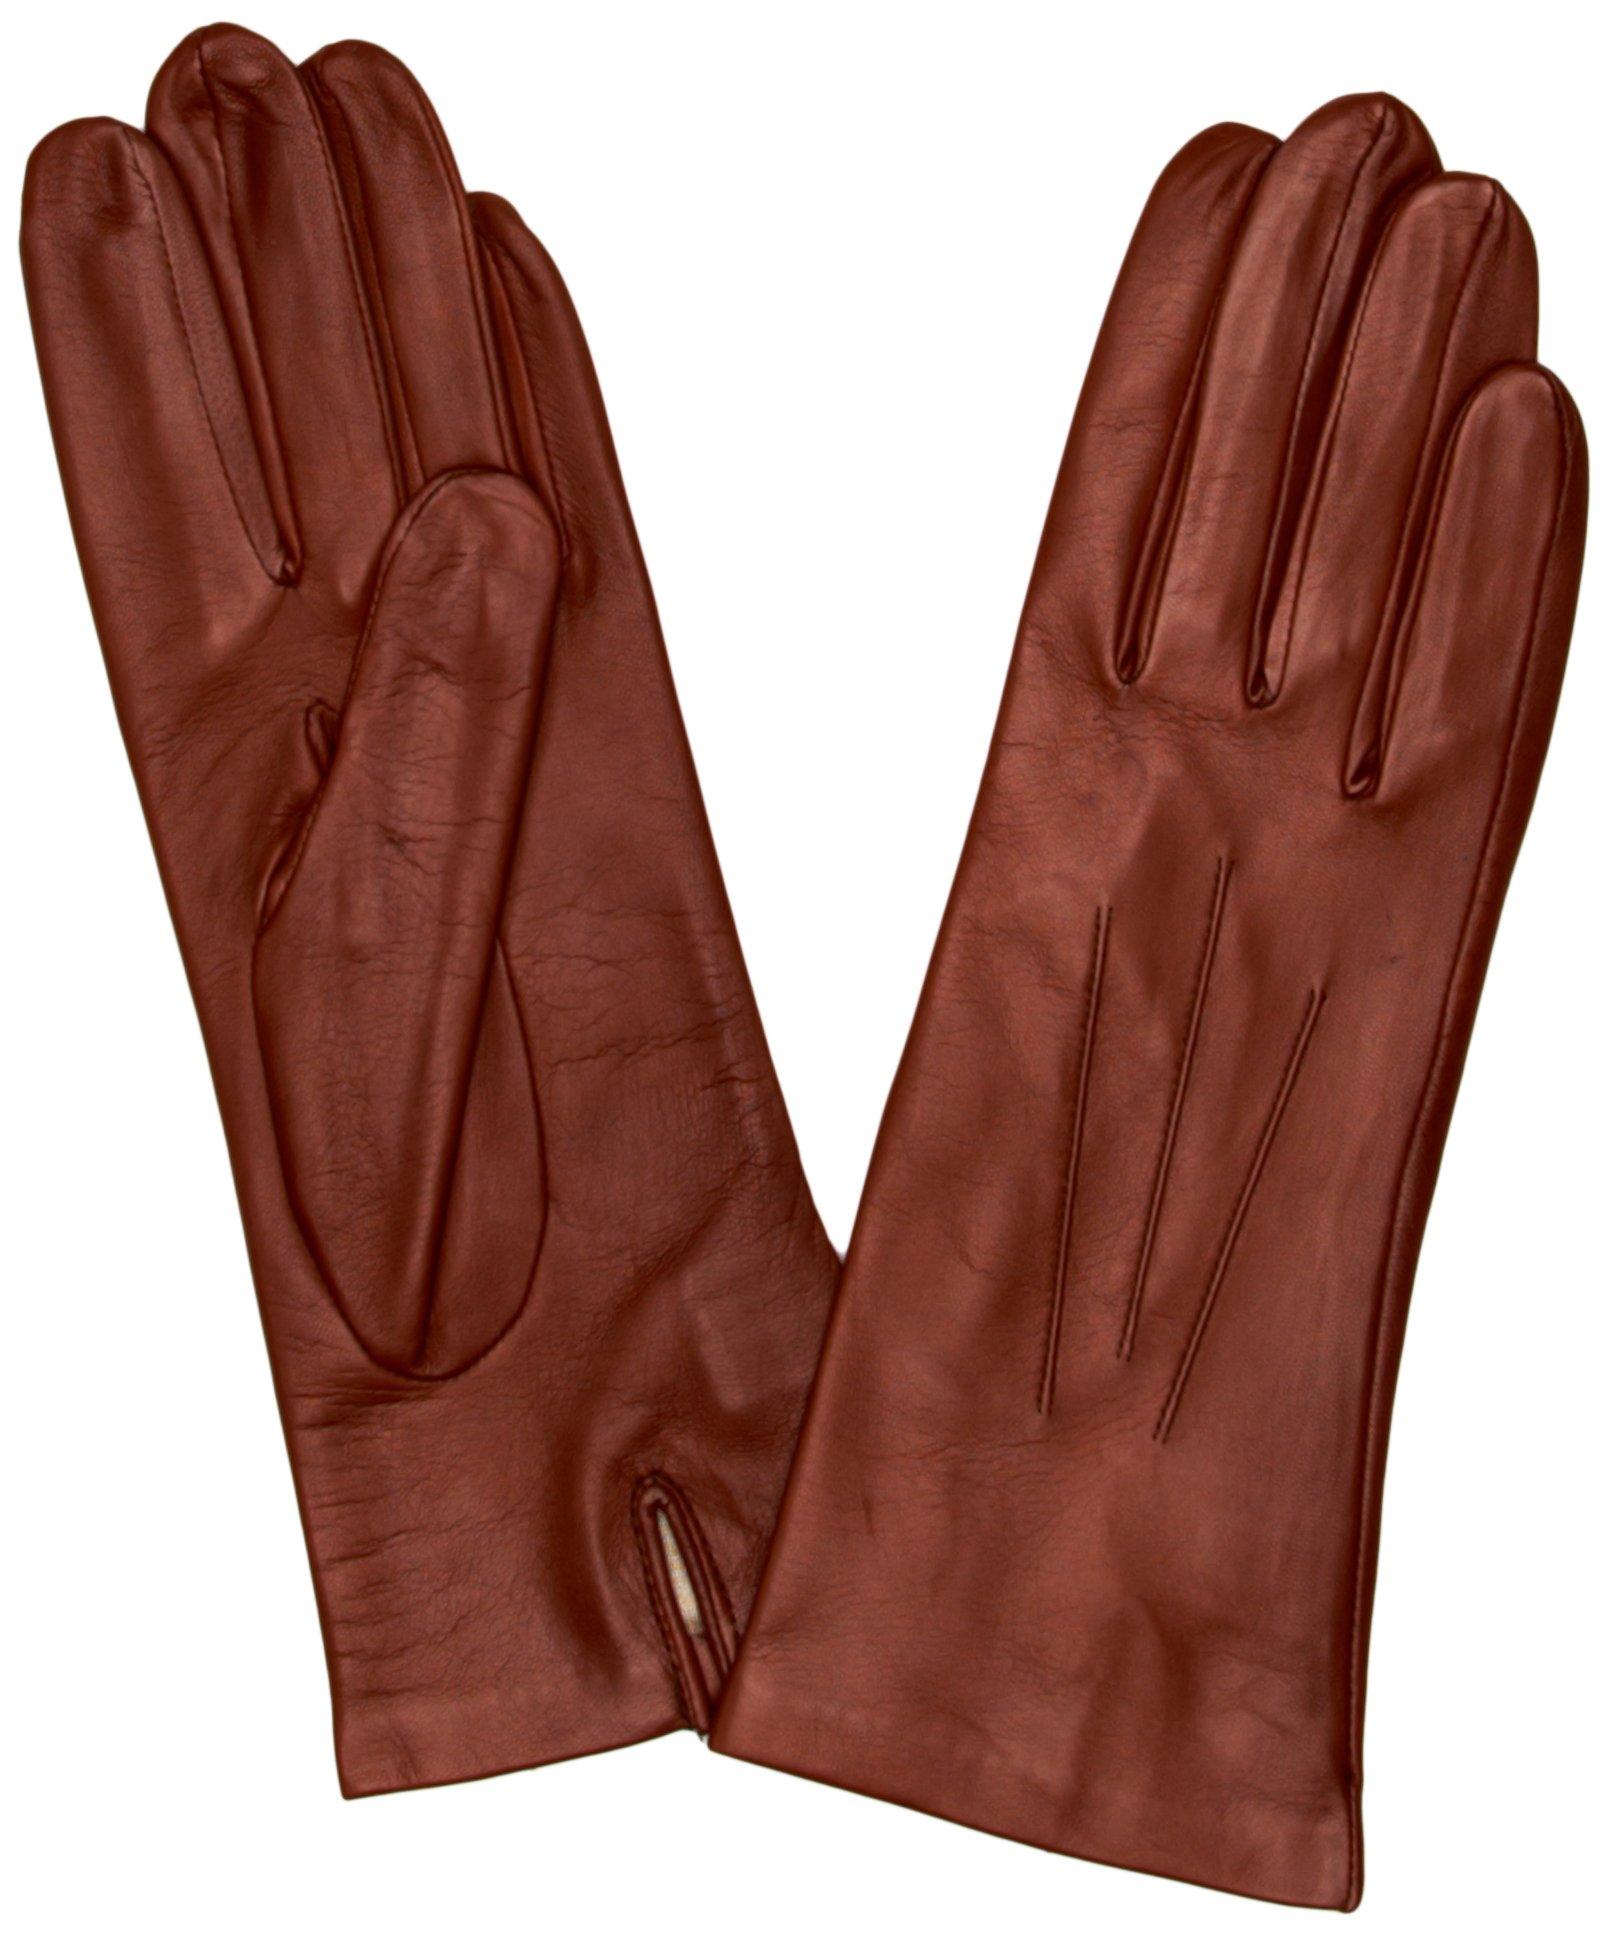 e8fcf692874281 Dents Damen Handschuhe 7-1049 | Amazon